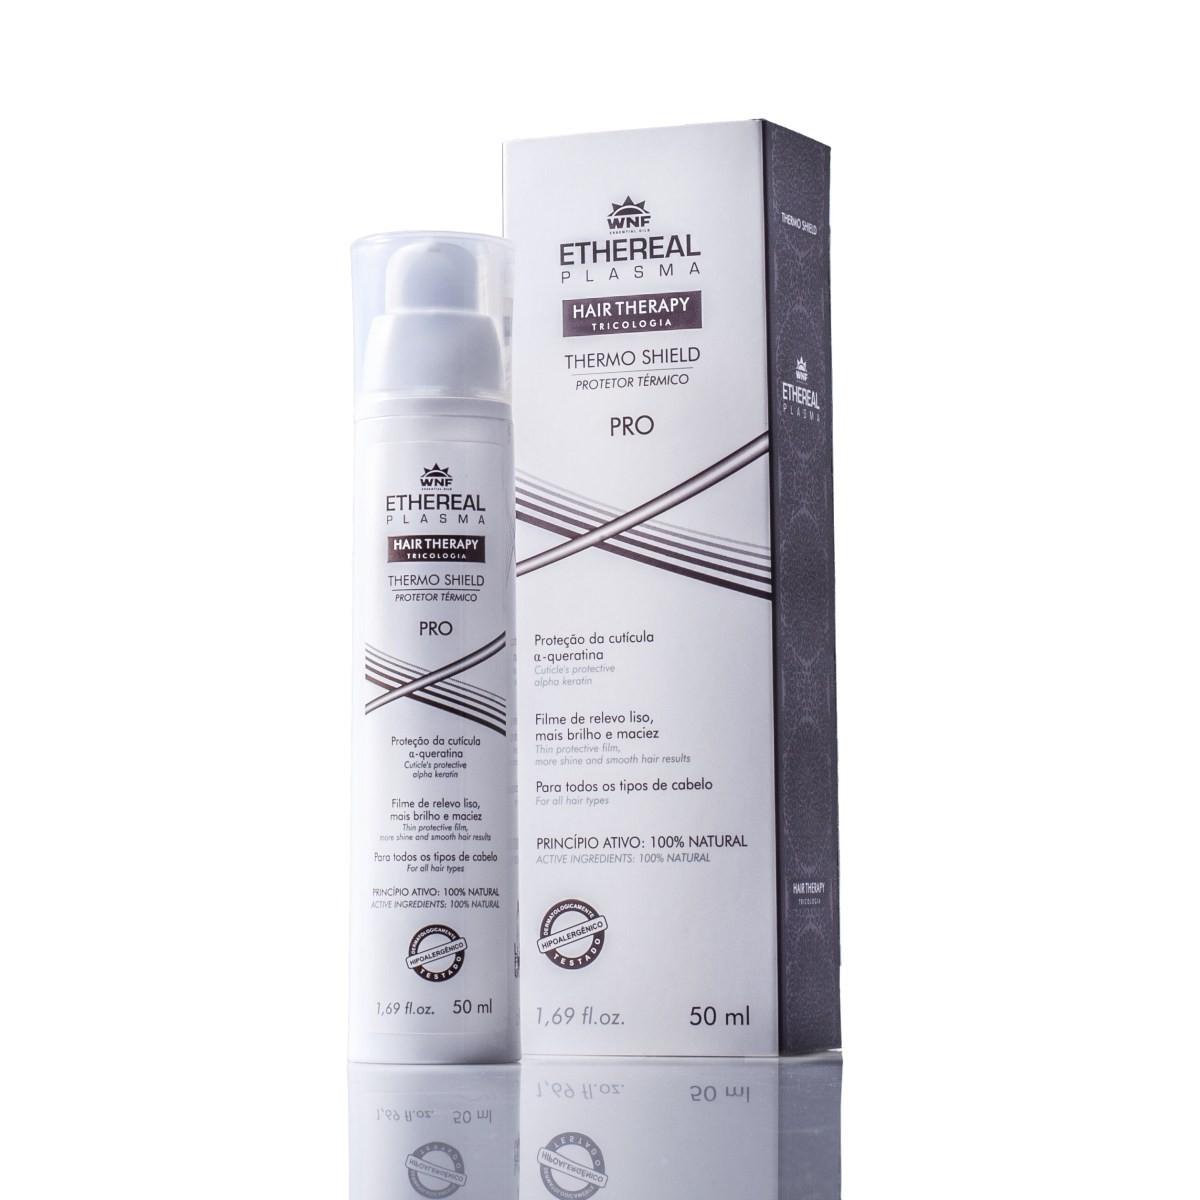 Protetor Térmico Vegano Ethereal Plasma WNF 50 ml